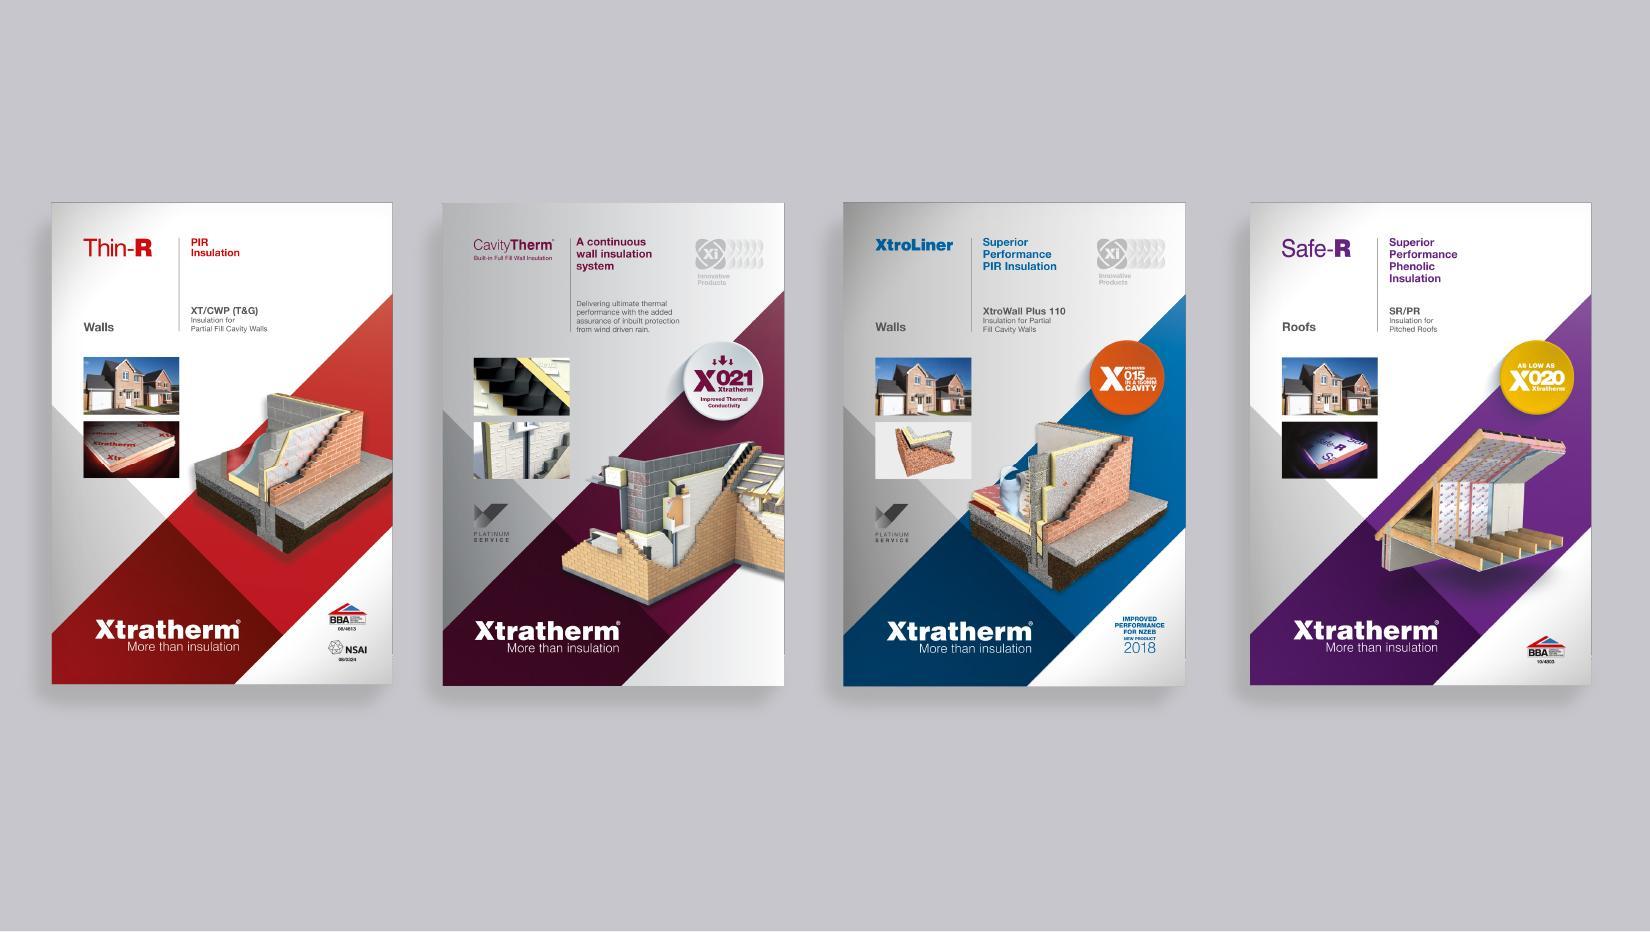 Xtratherm Product Brochure Ranges